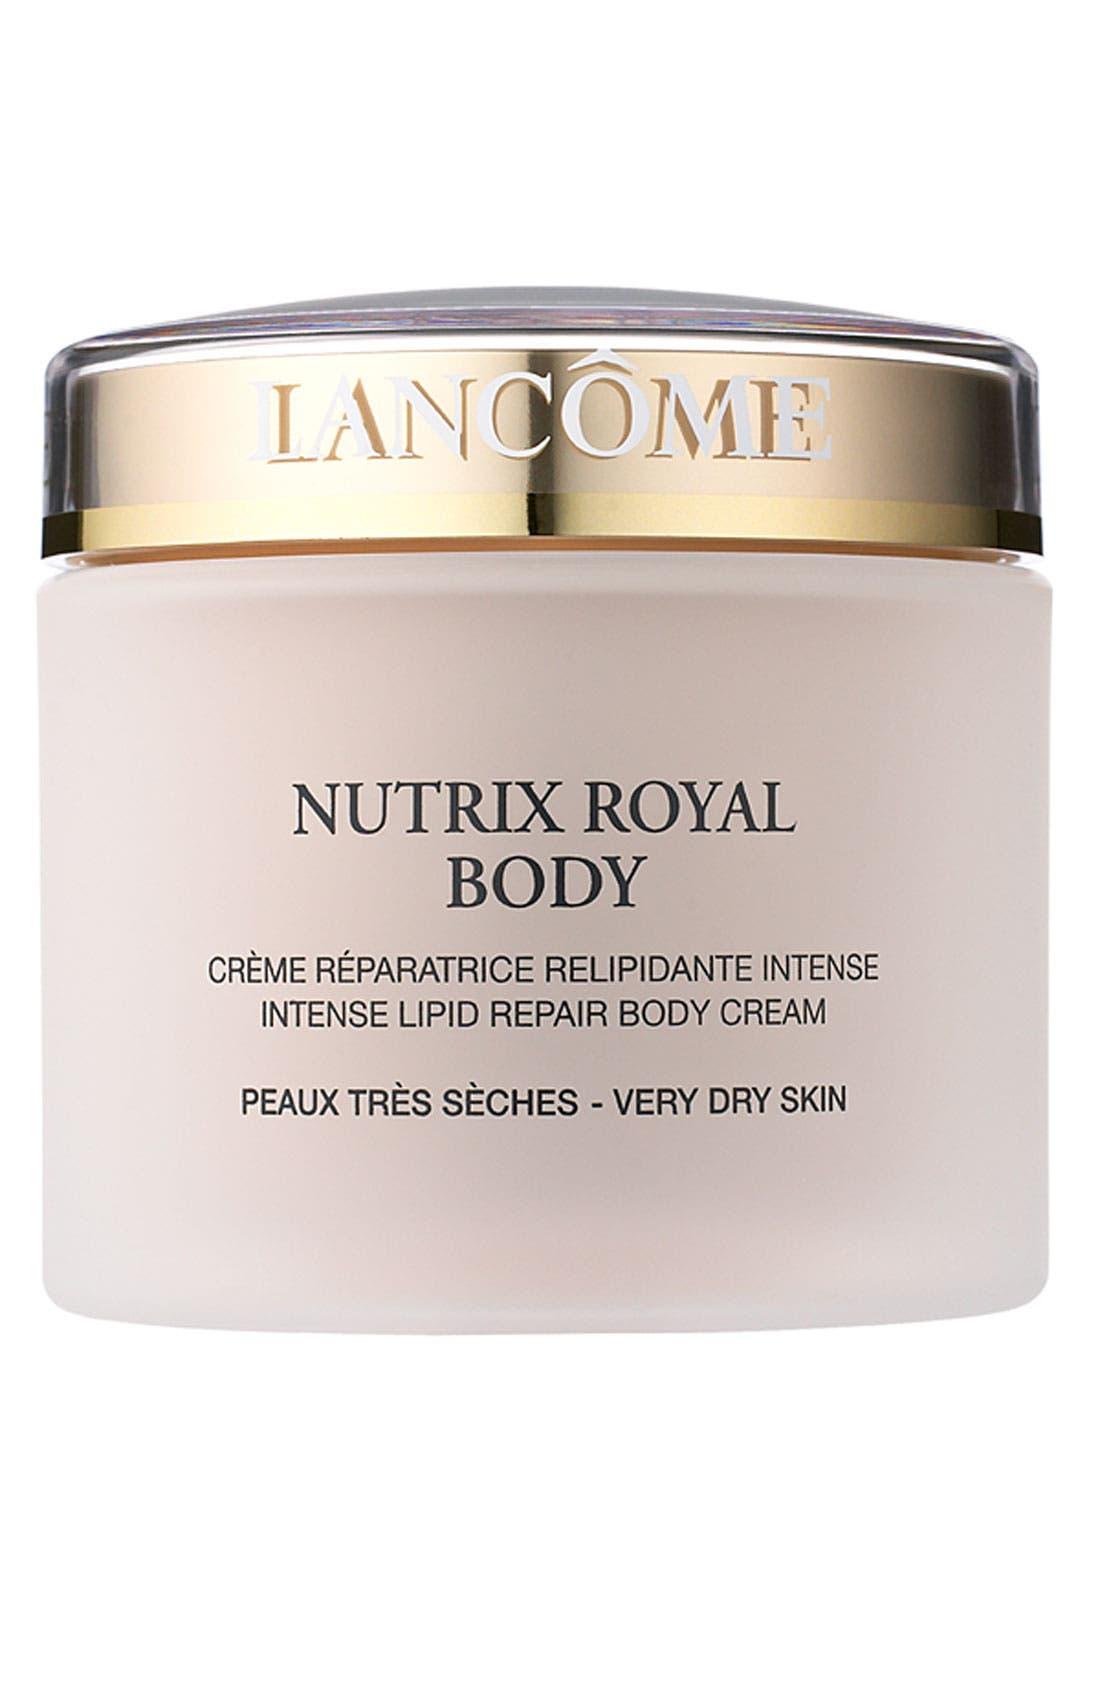 Lancome Nutrix Royal Body Nourishing Moisturizer Cream